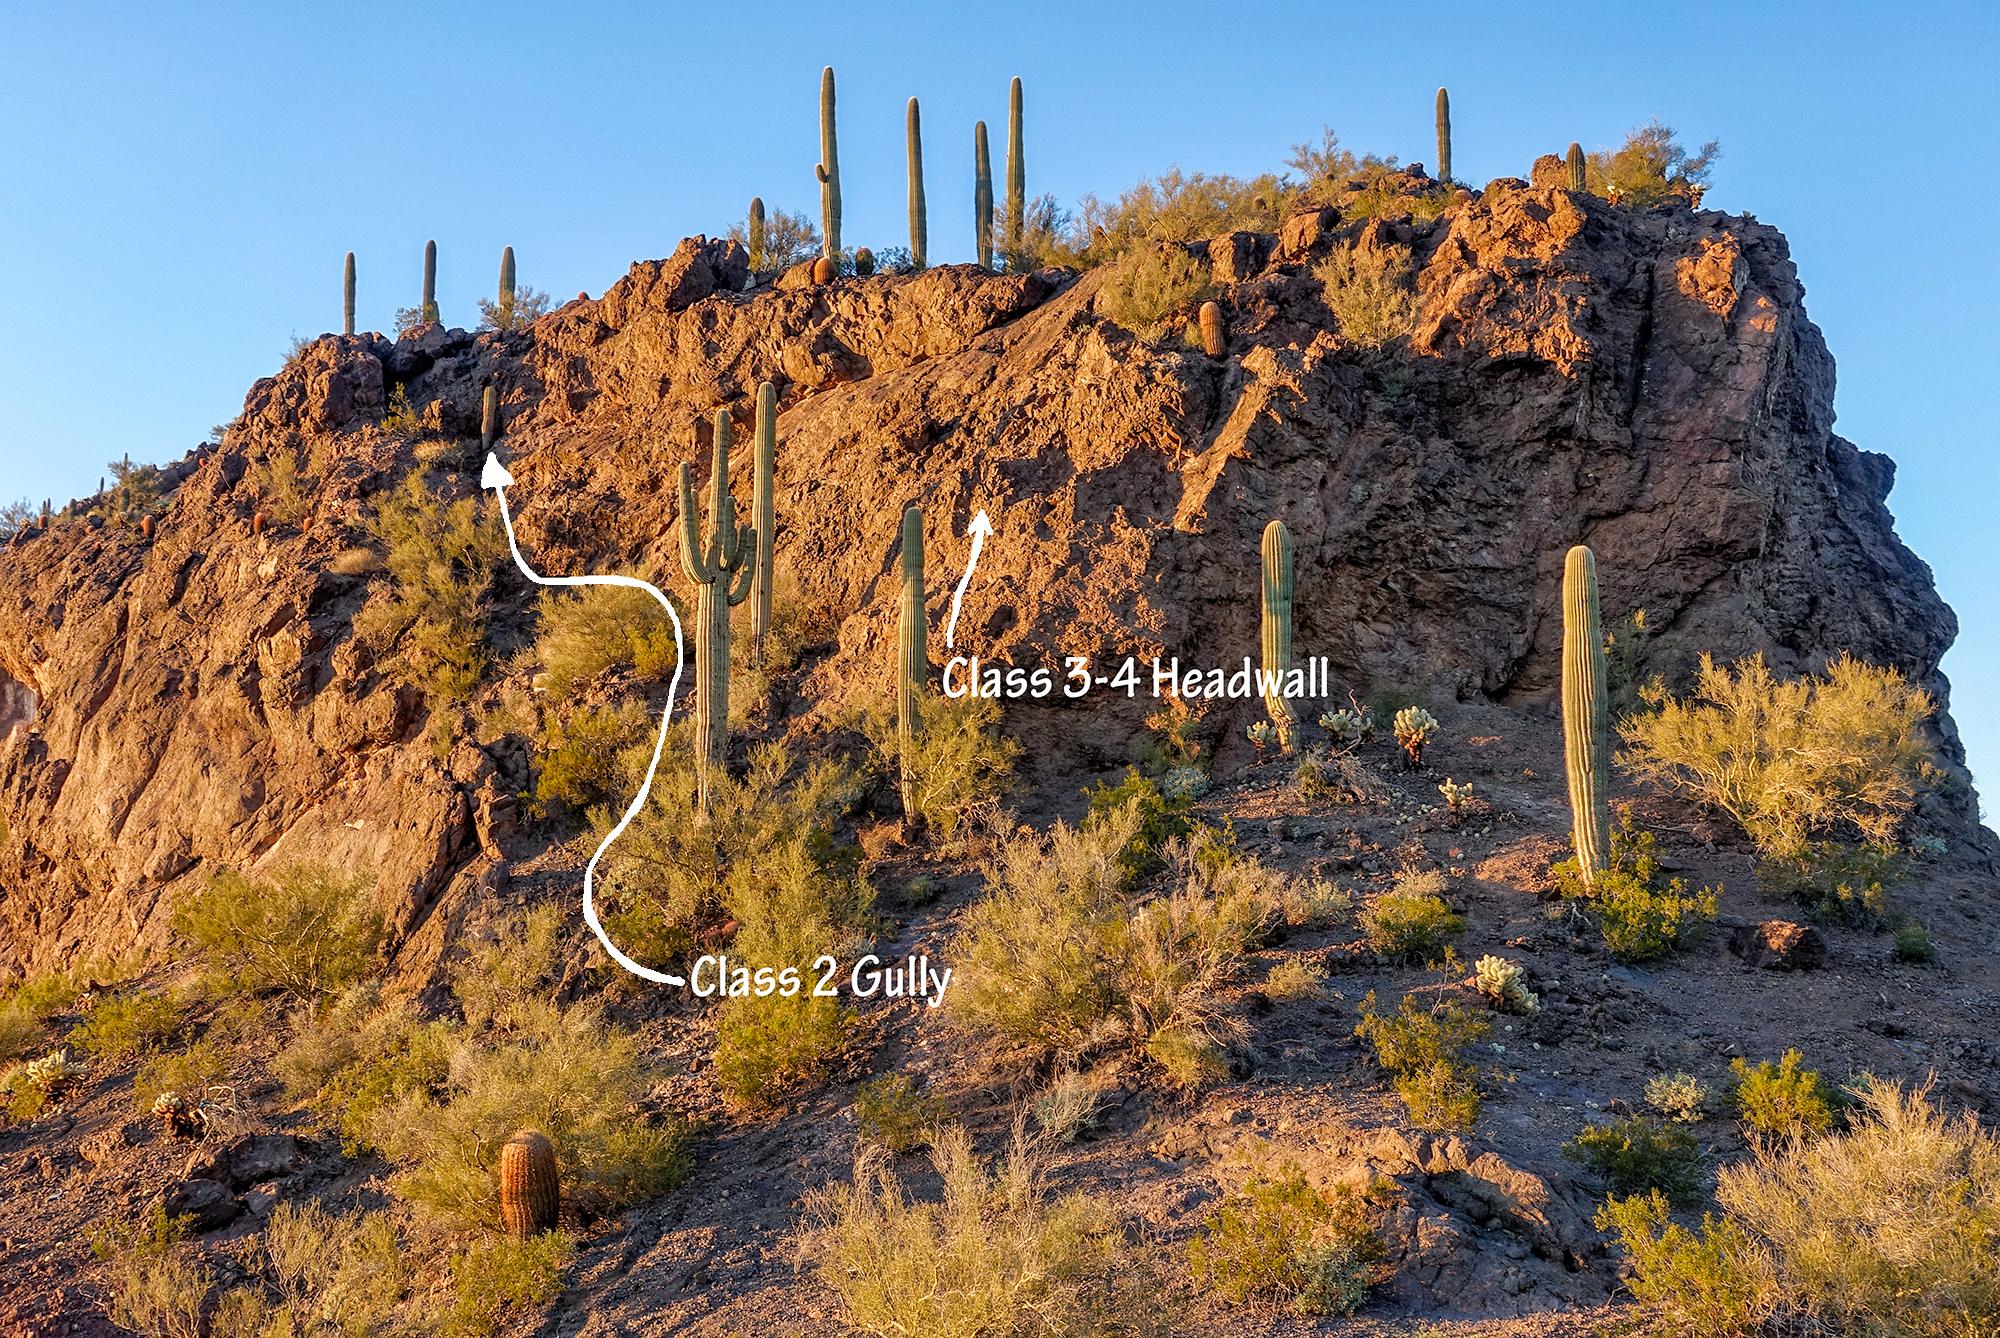 North Summit Route, Initial Difficulties. Picacho Peak, Arizona, 2016